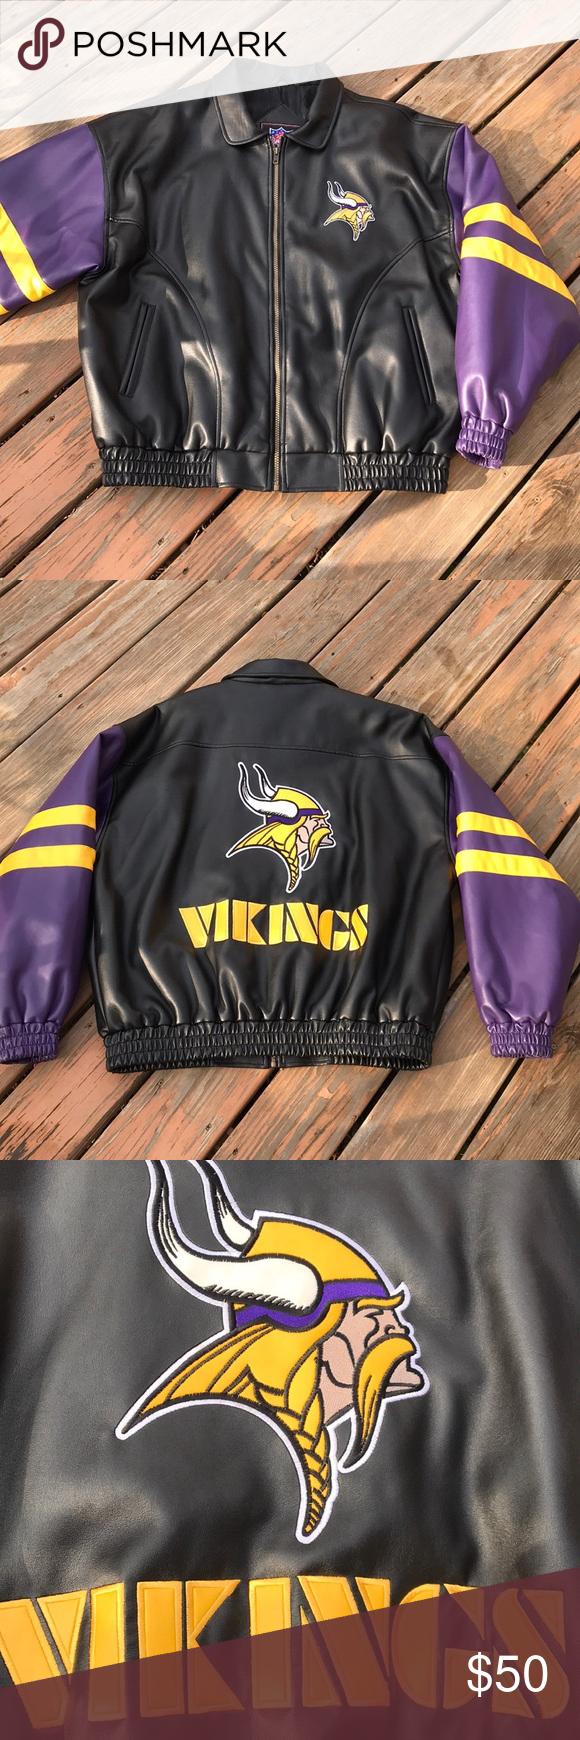 Vikings Jacket Jackets Embroidered Jacket Clothes Design [ 1740 x 580 Pixel ]